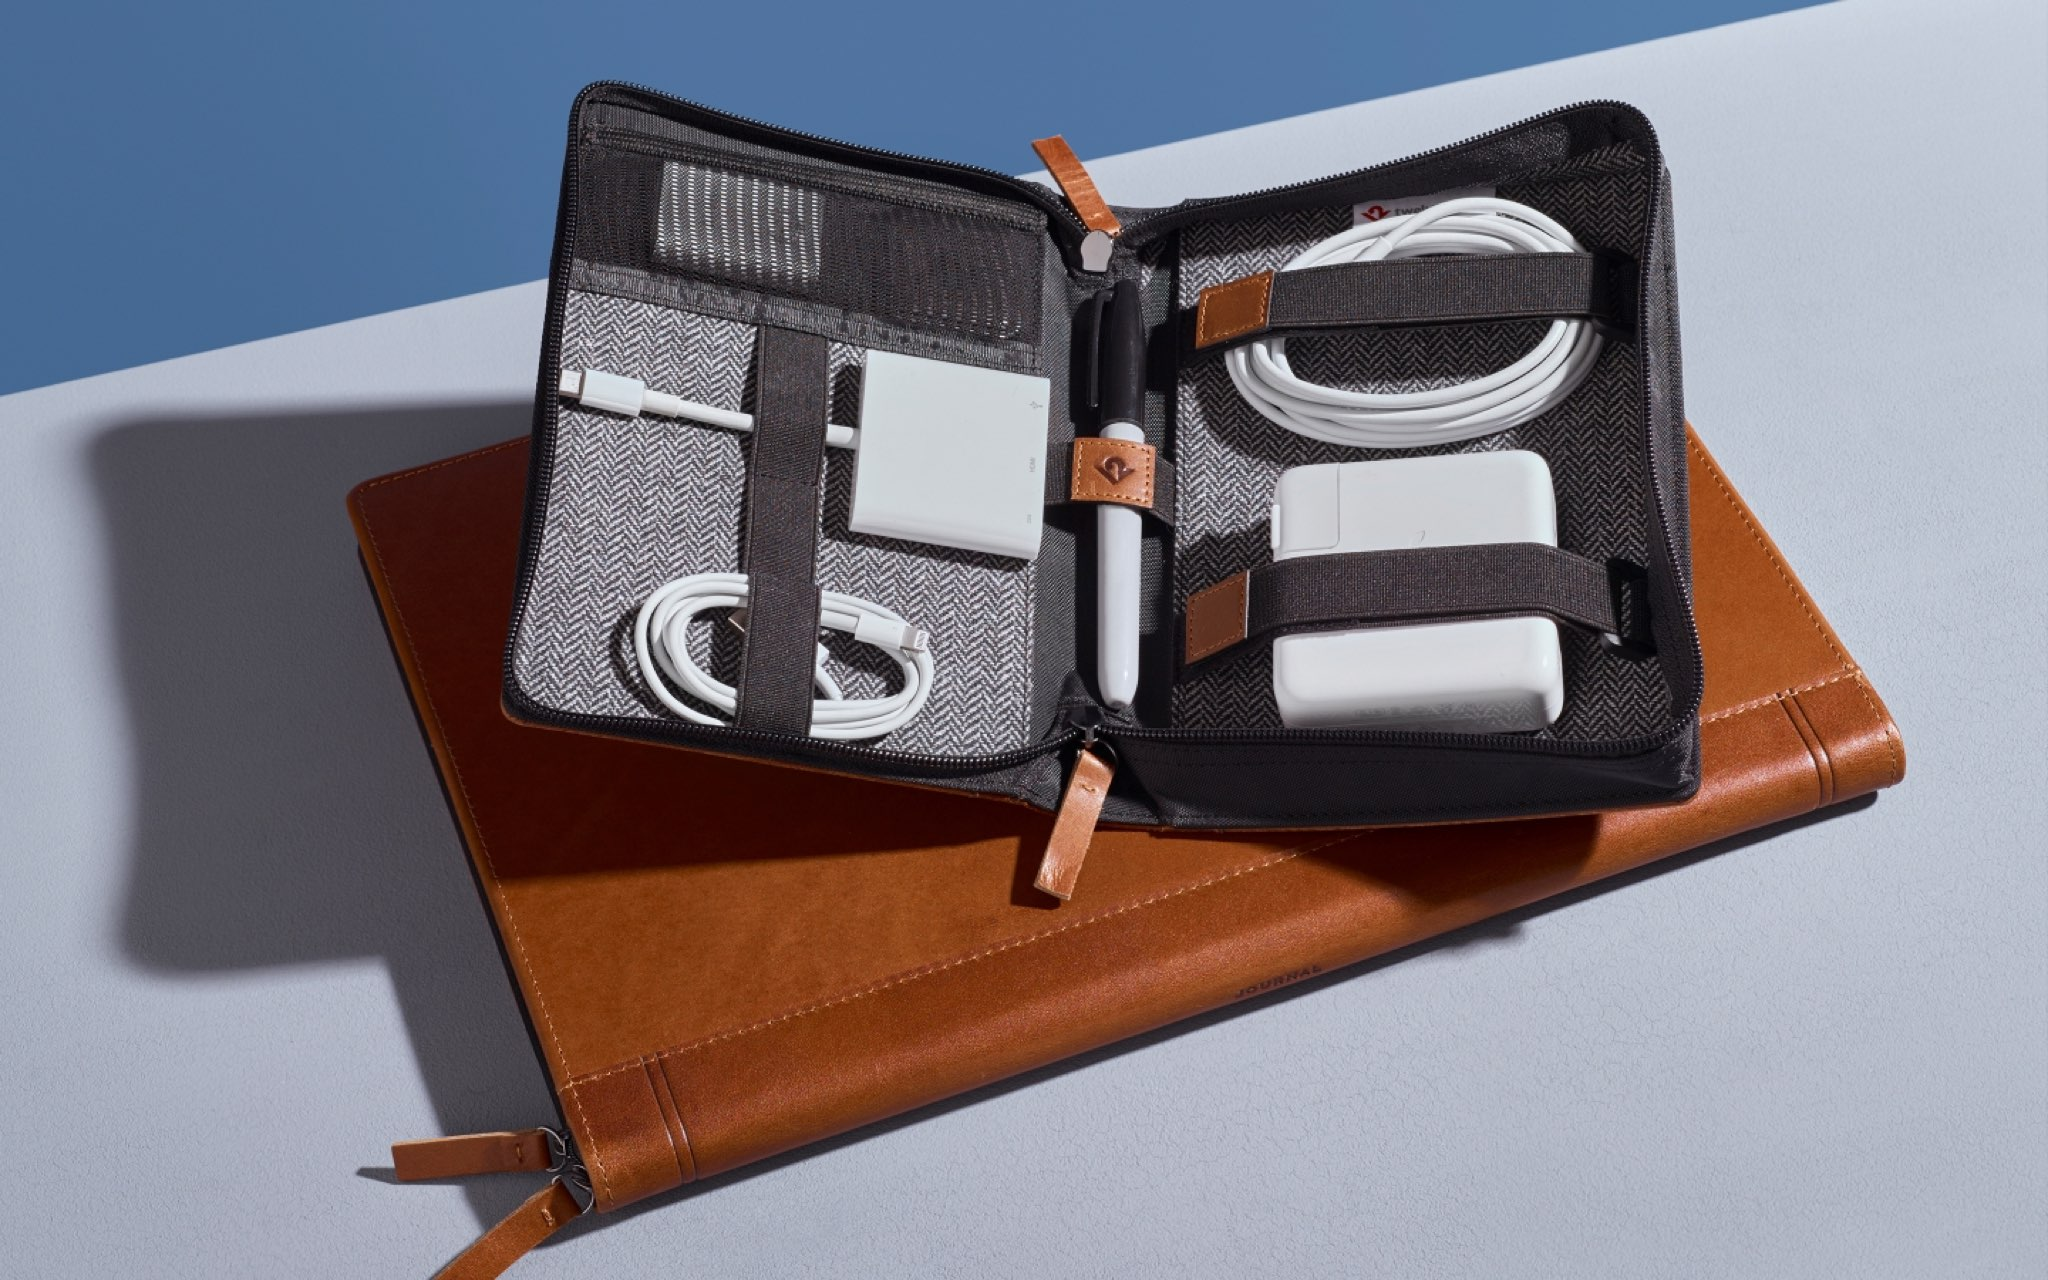 Travel organizer case for accessories